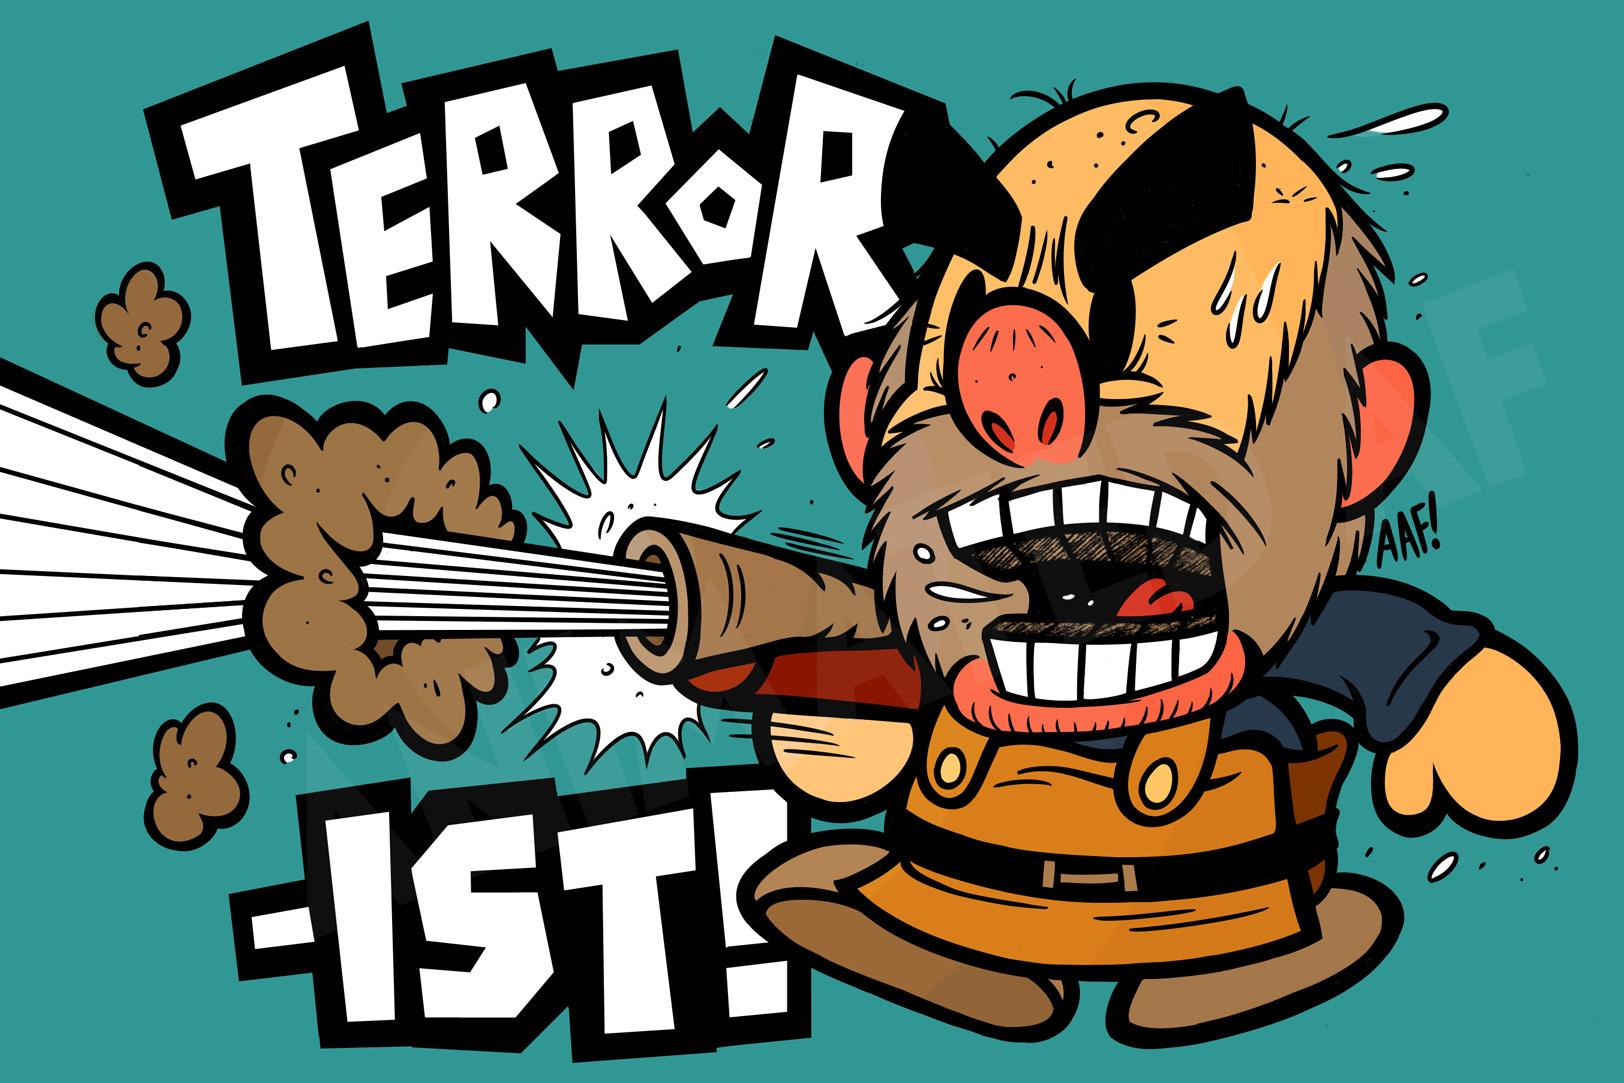 Terrorist! *BANG*